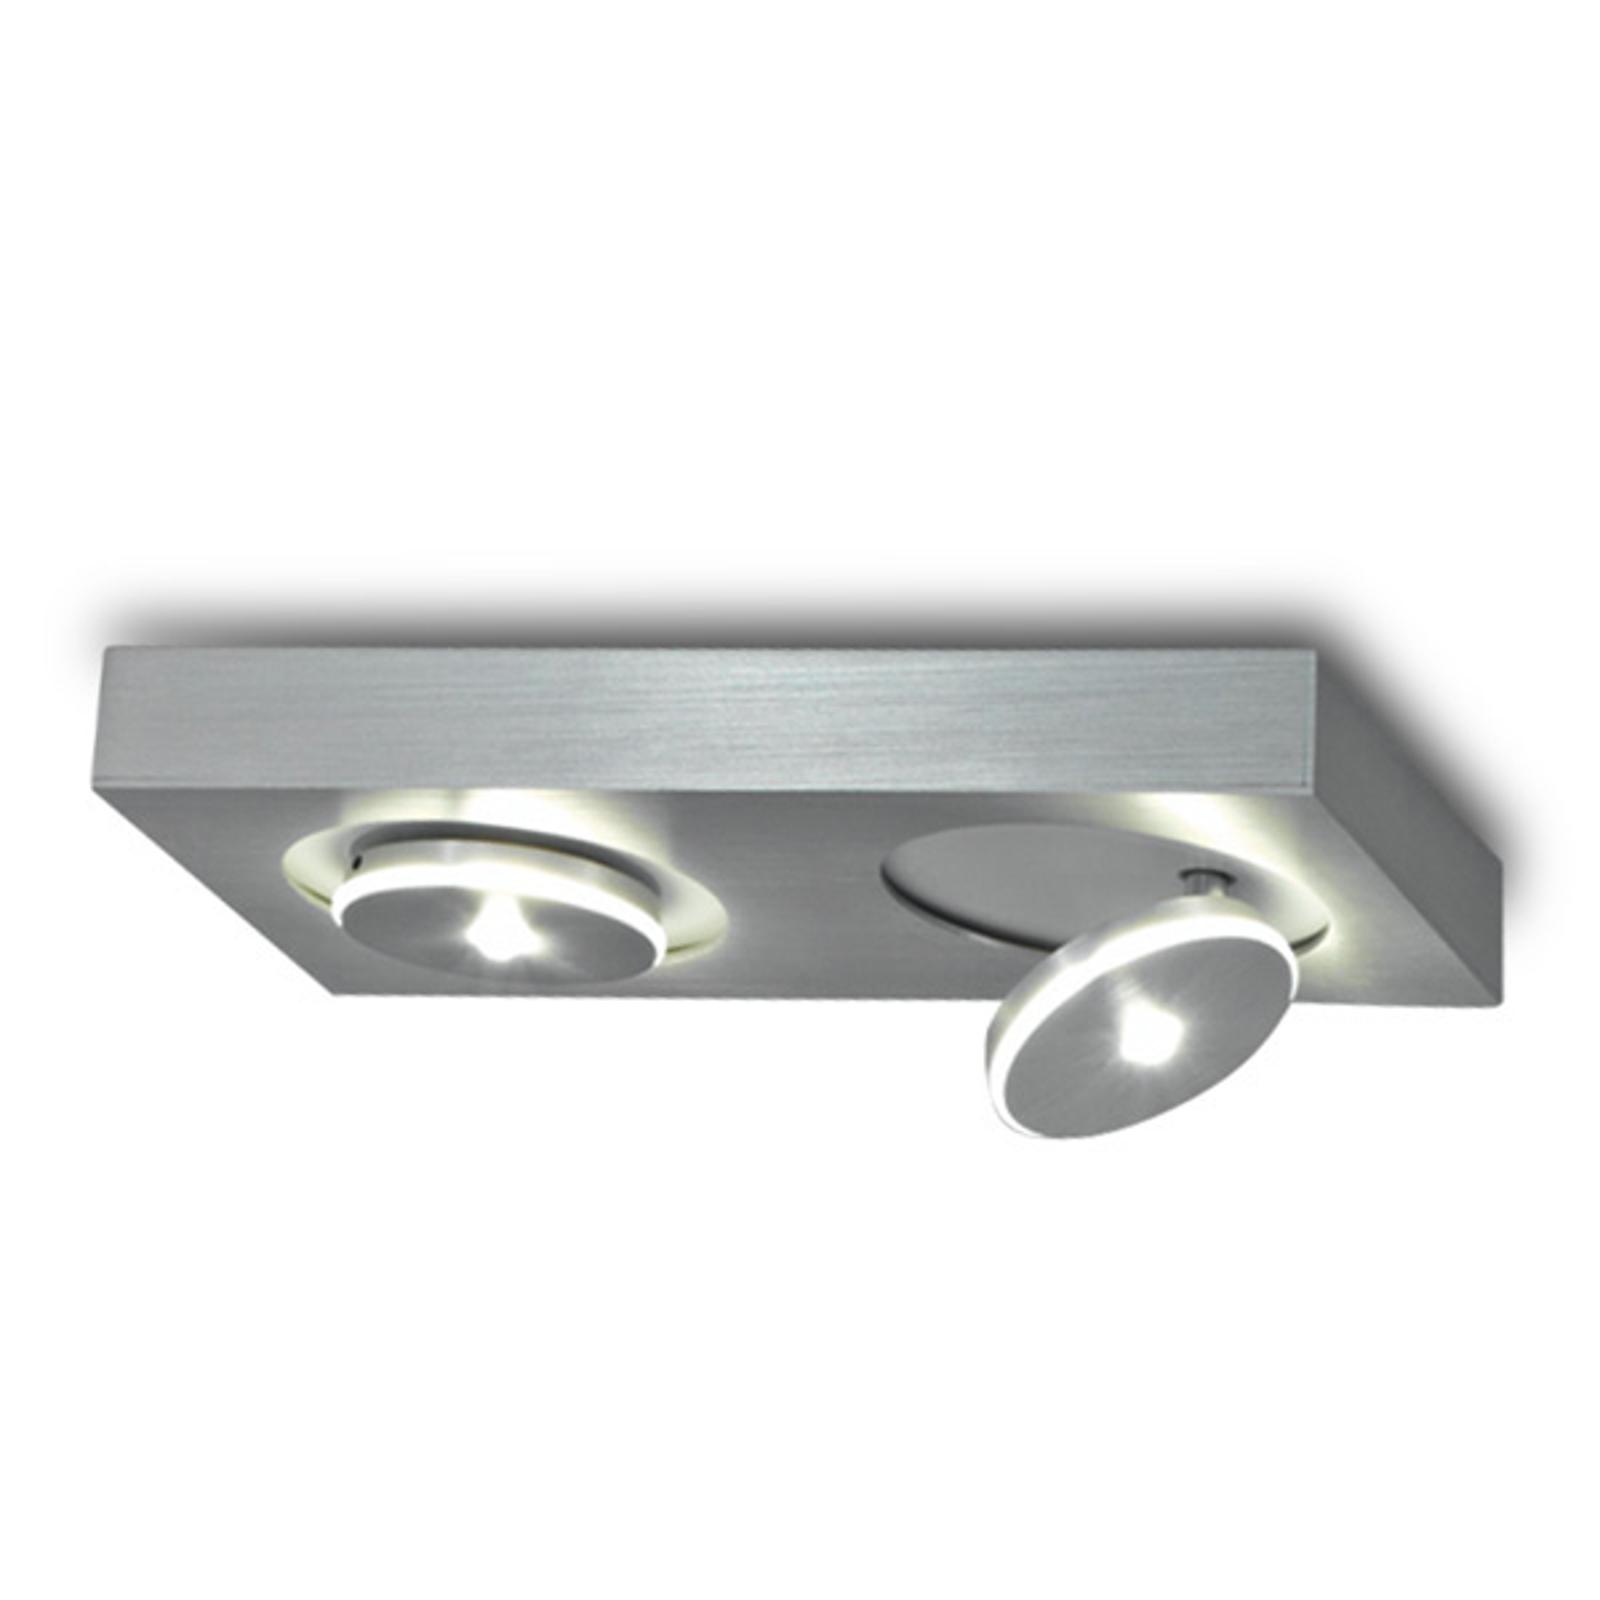 Moderne plafondlamp Spot It met LED